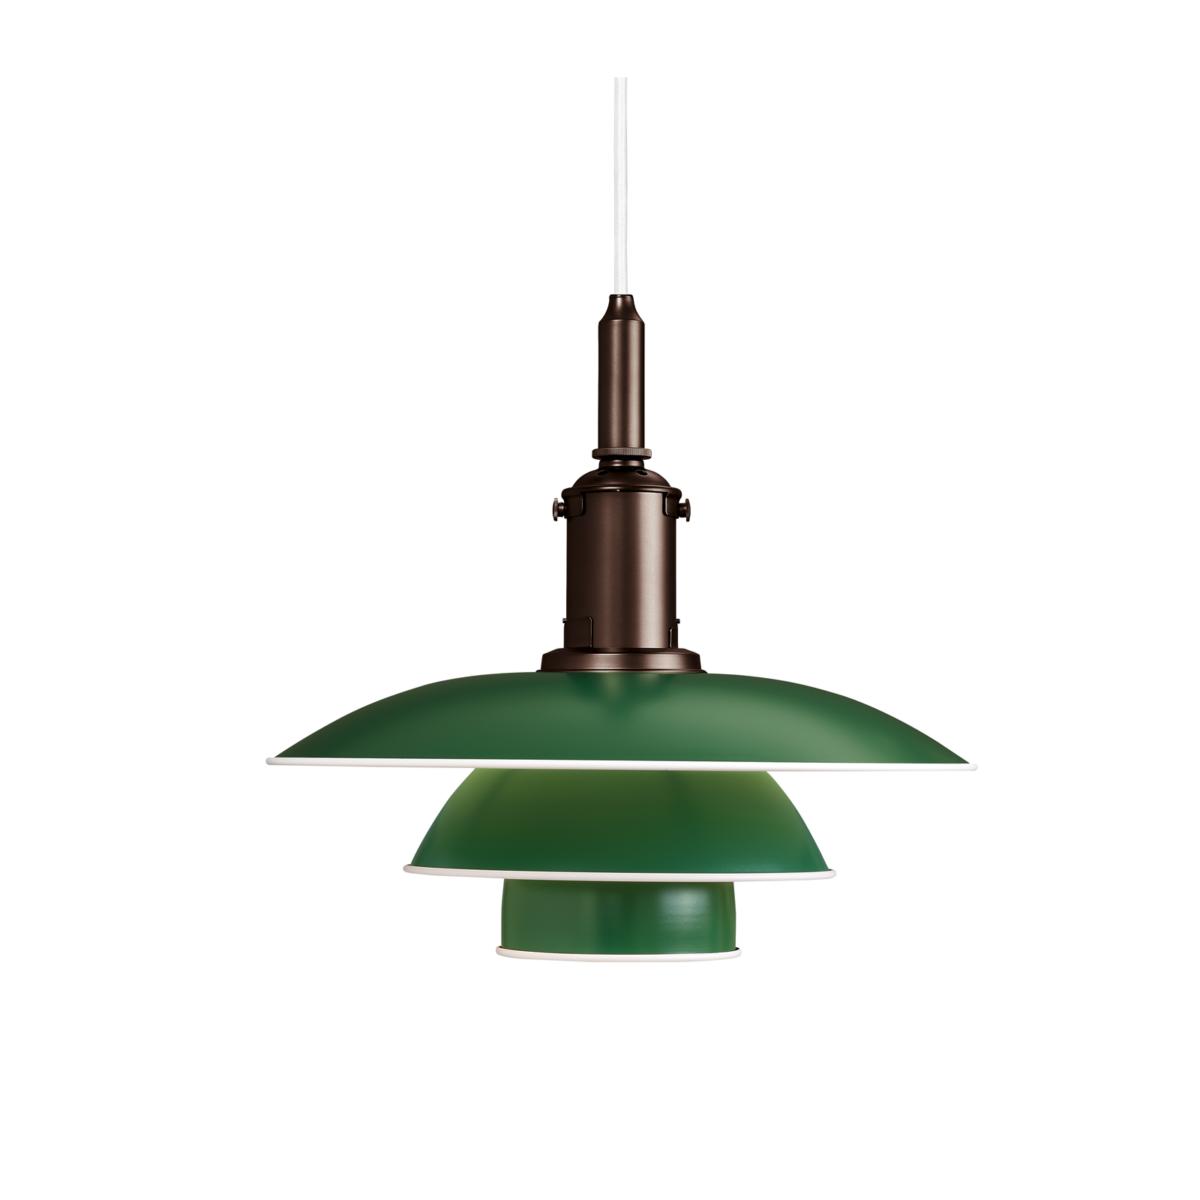 Louis Poulsen PH 3 12 3 Pendel Grön Glashuset malmo